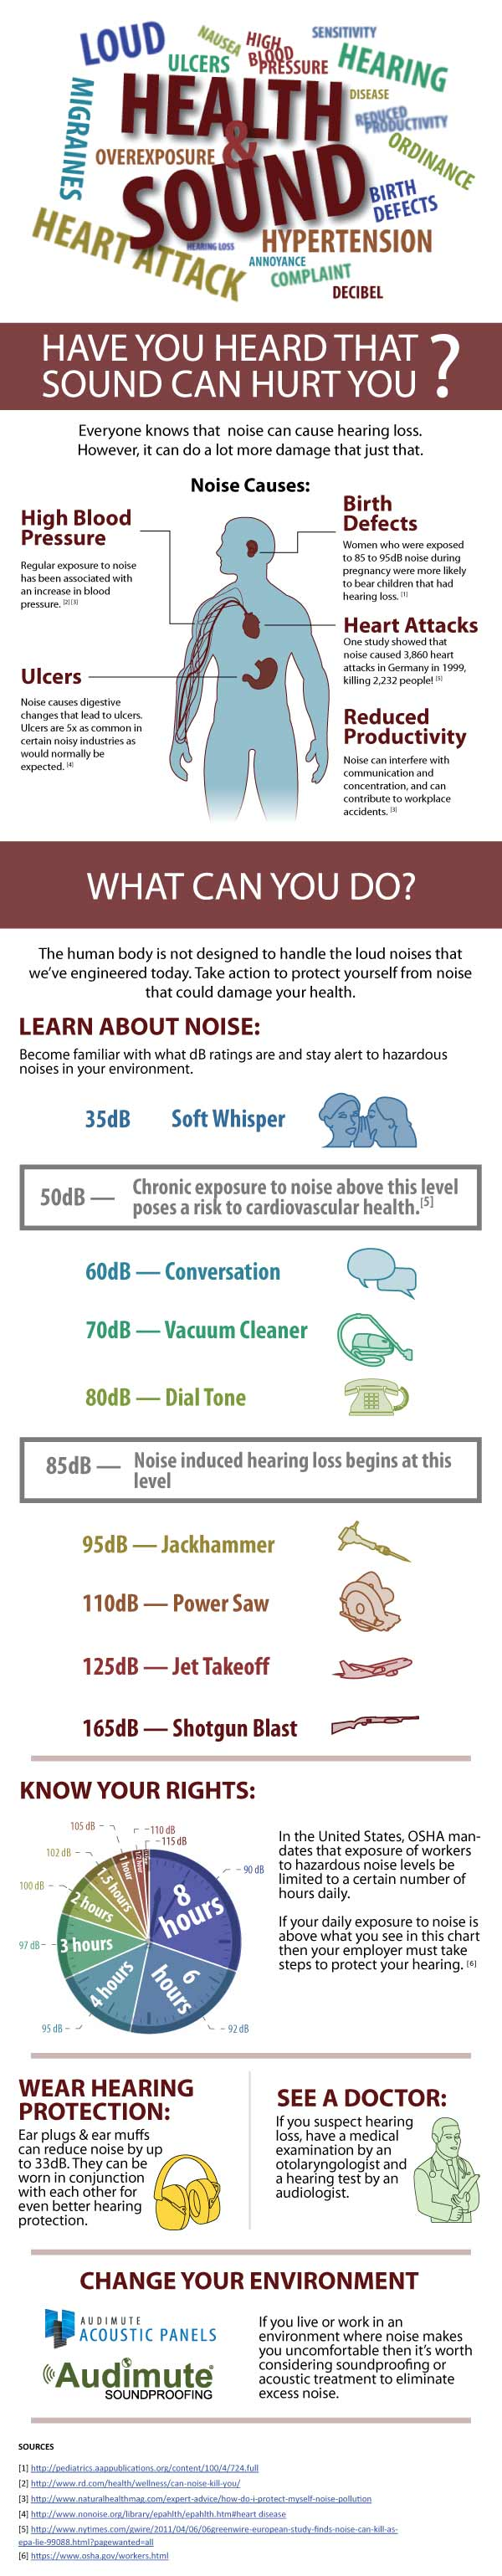 Health & Sound Infographic